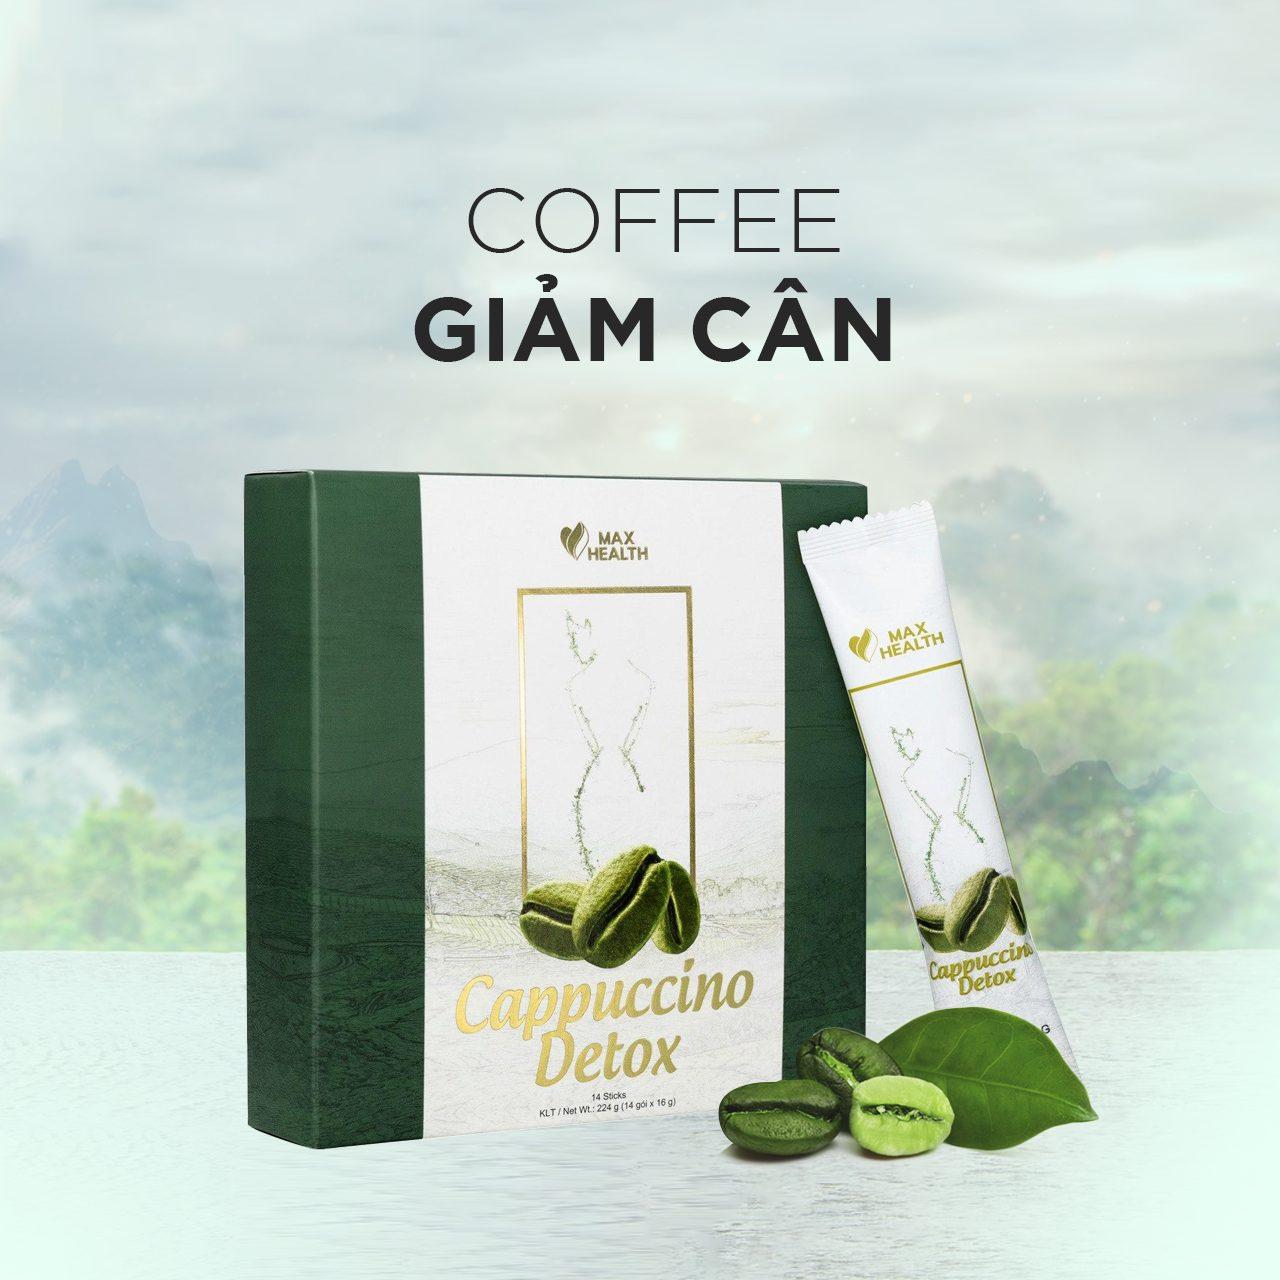 Coffee Cappuccino Detox Cà Phê Xanh Giảm Cân Matxi Corp